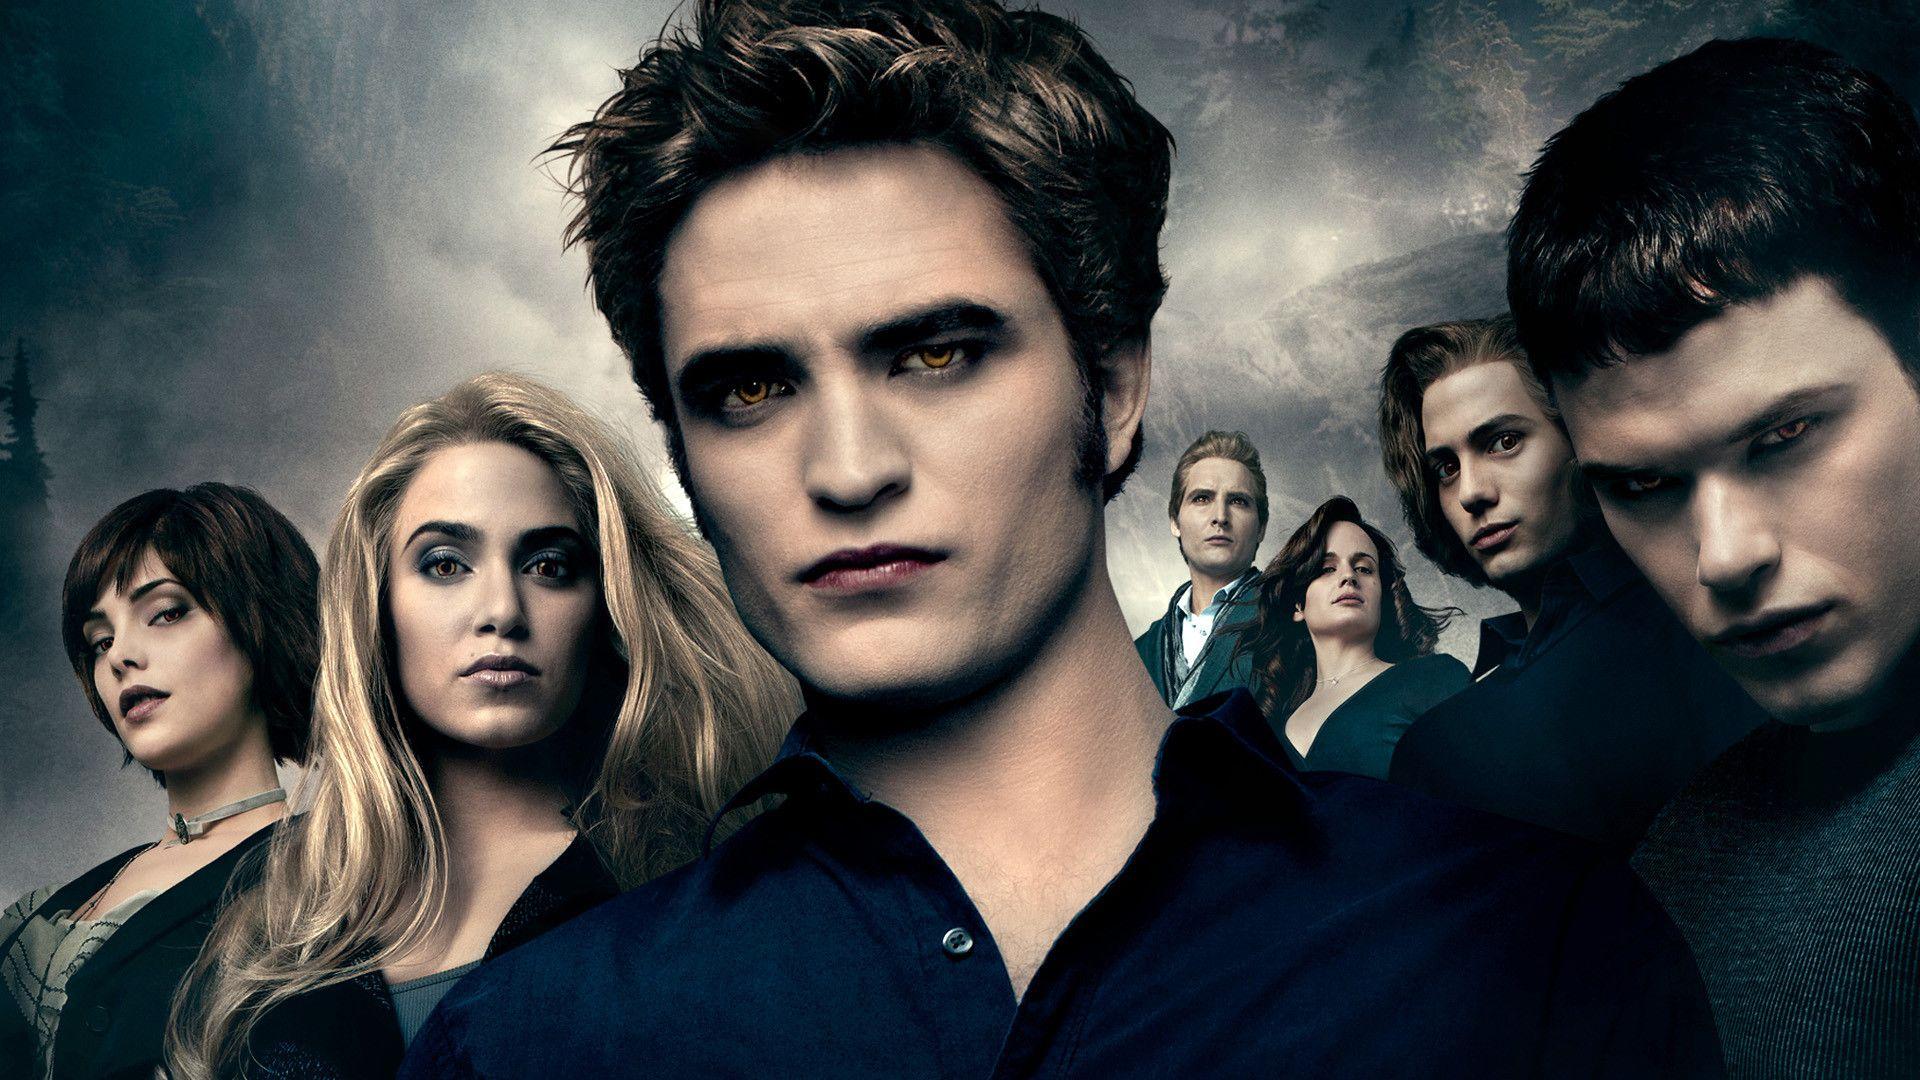 The Twilight Saga Eclipse Wallpaper Twilight Saga Peliculas Series